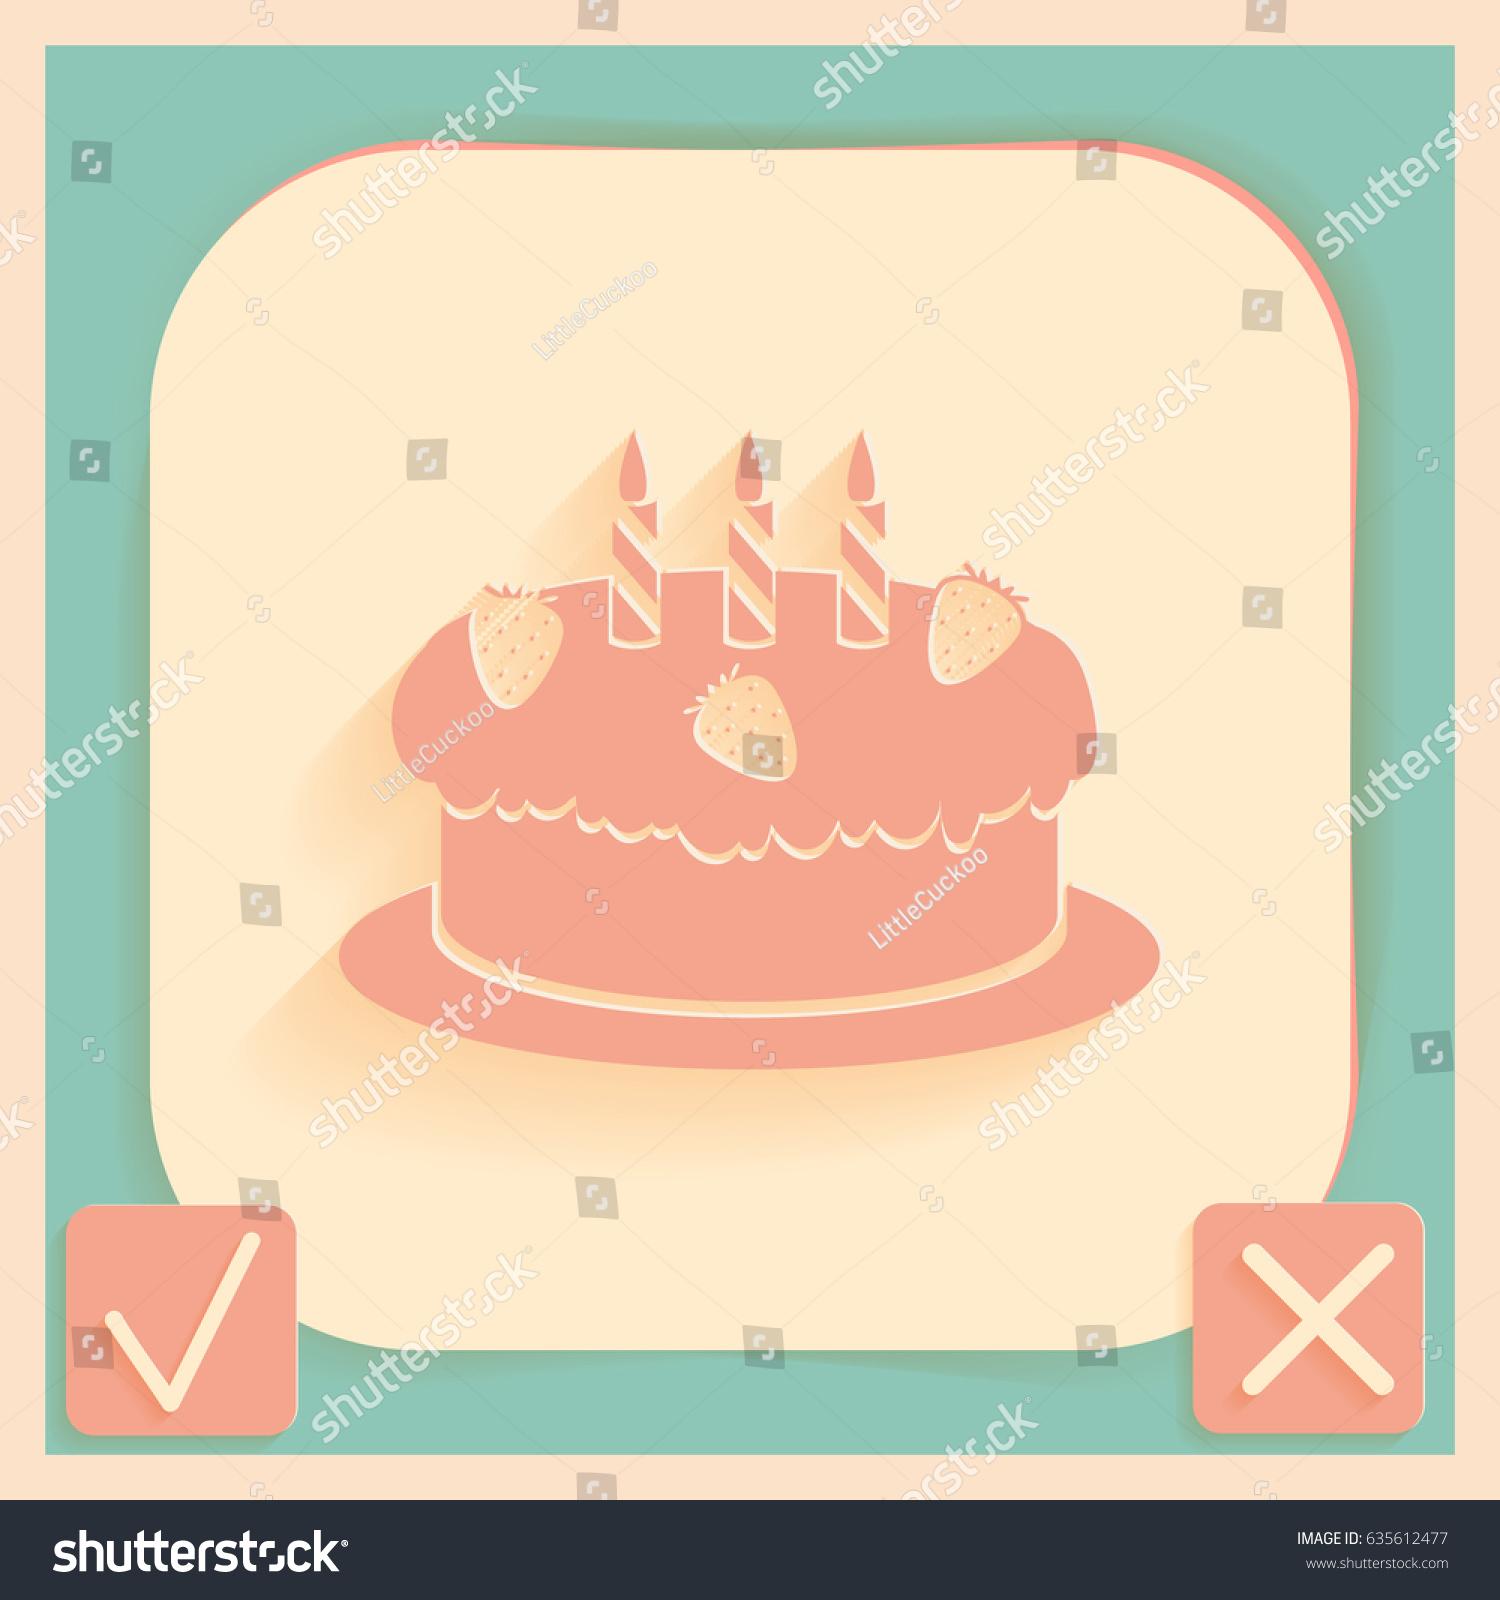 Birthday cake icon symbol cake celebrating stock vector 635612477 birthday cake icon symbol of cake celebrating the birthday of the loaf buycottarizona